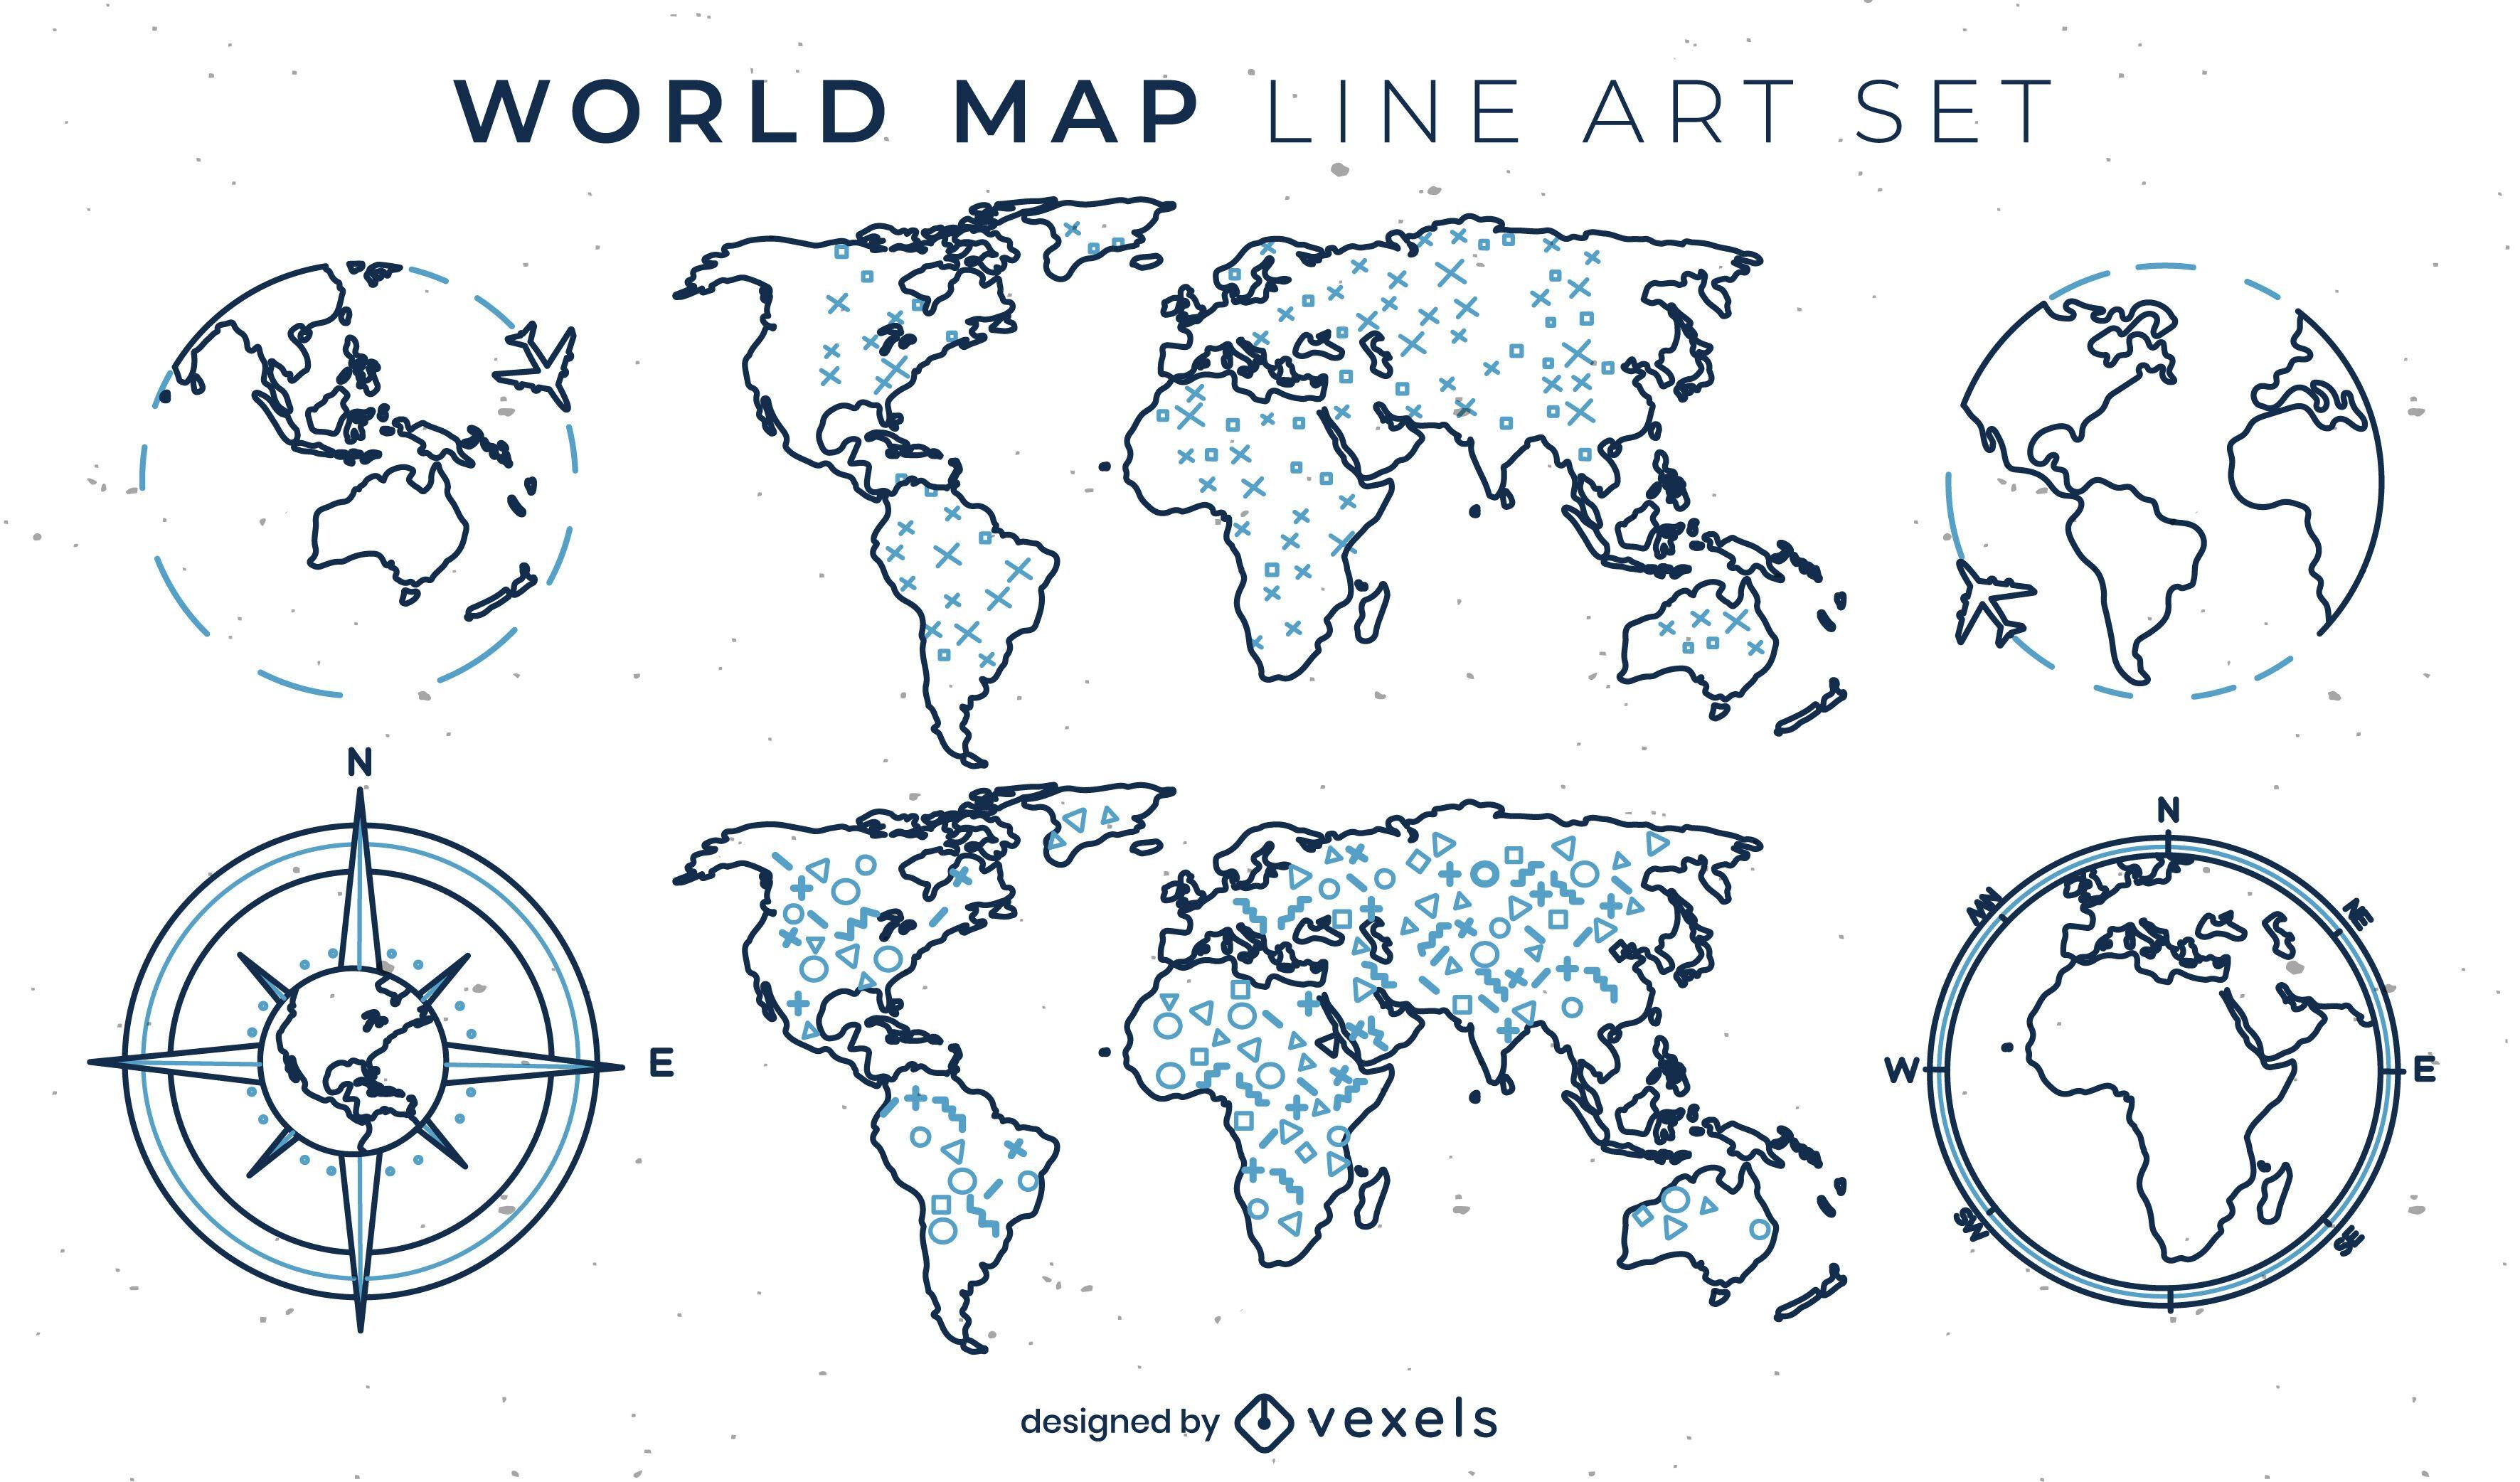 World map set of line art elements